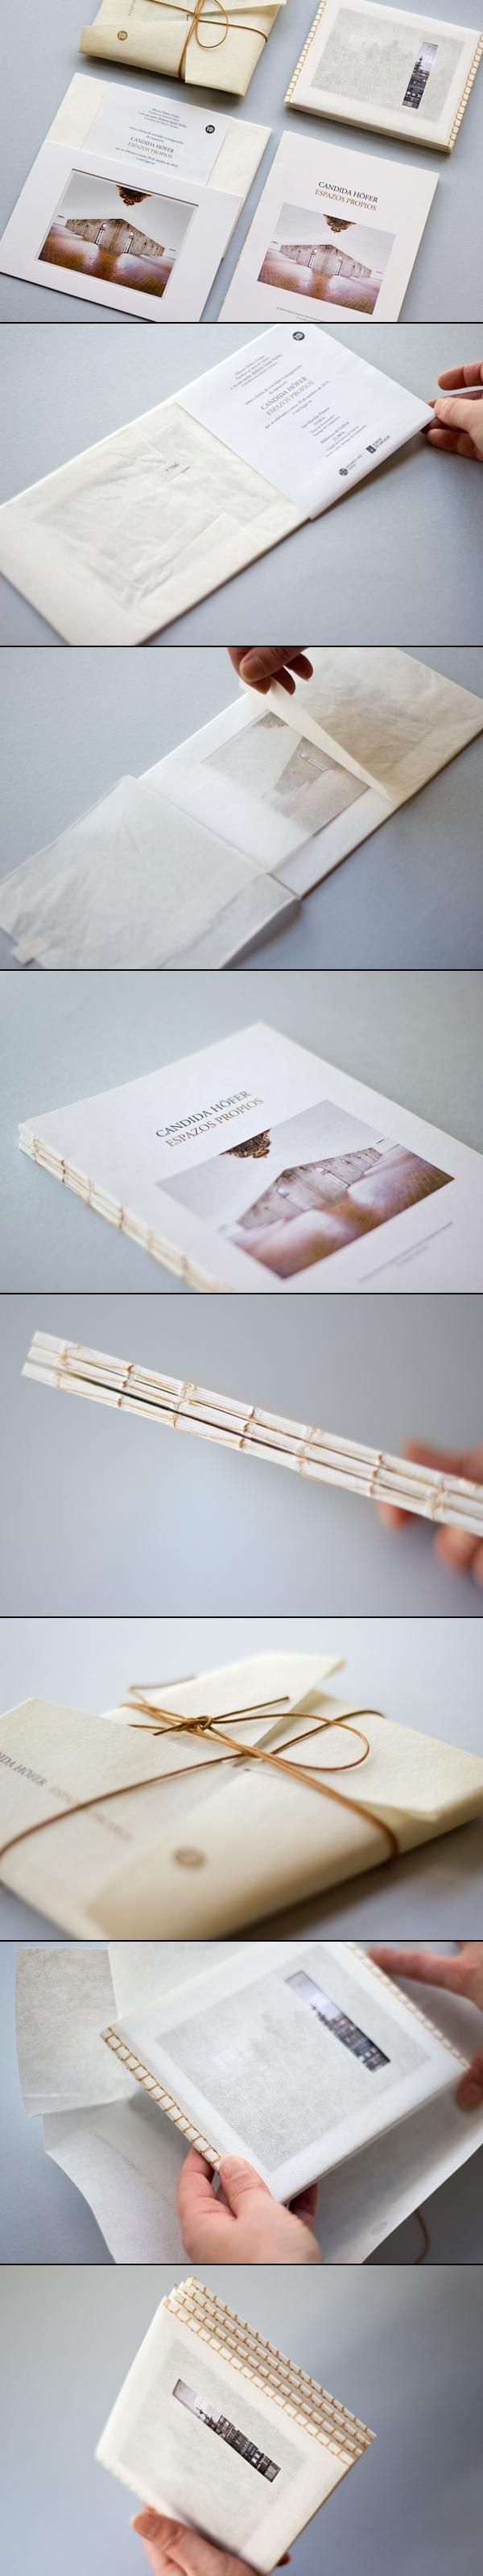 Candida Hofer. Espazos Propios - Editorial / Print / Graphic / Book design - Hand bound - Book binding